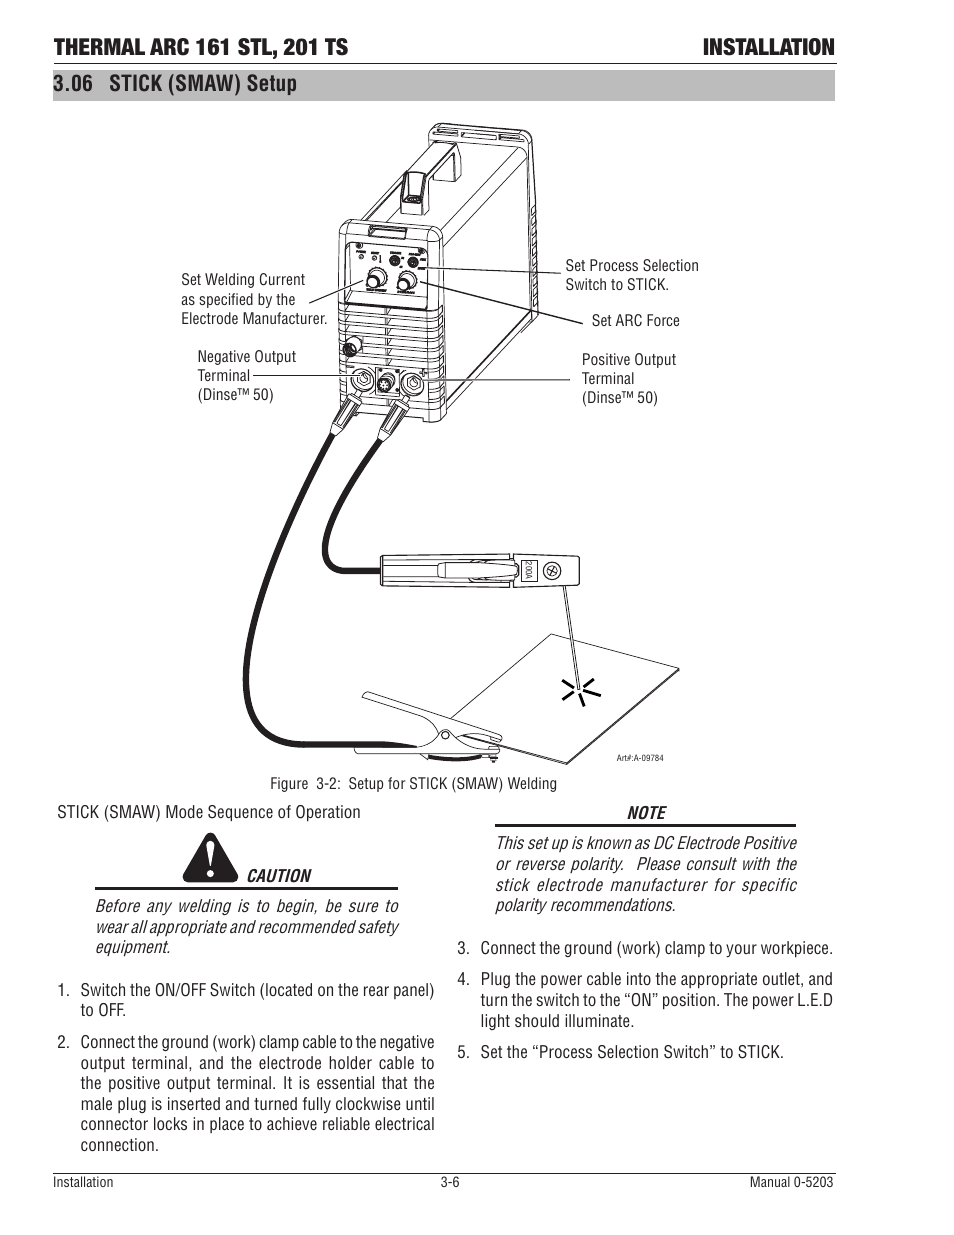 medium resolution of 06 stick smaw setup tweco 201 ts thermal arc user manual page 24 58